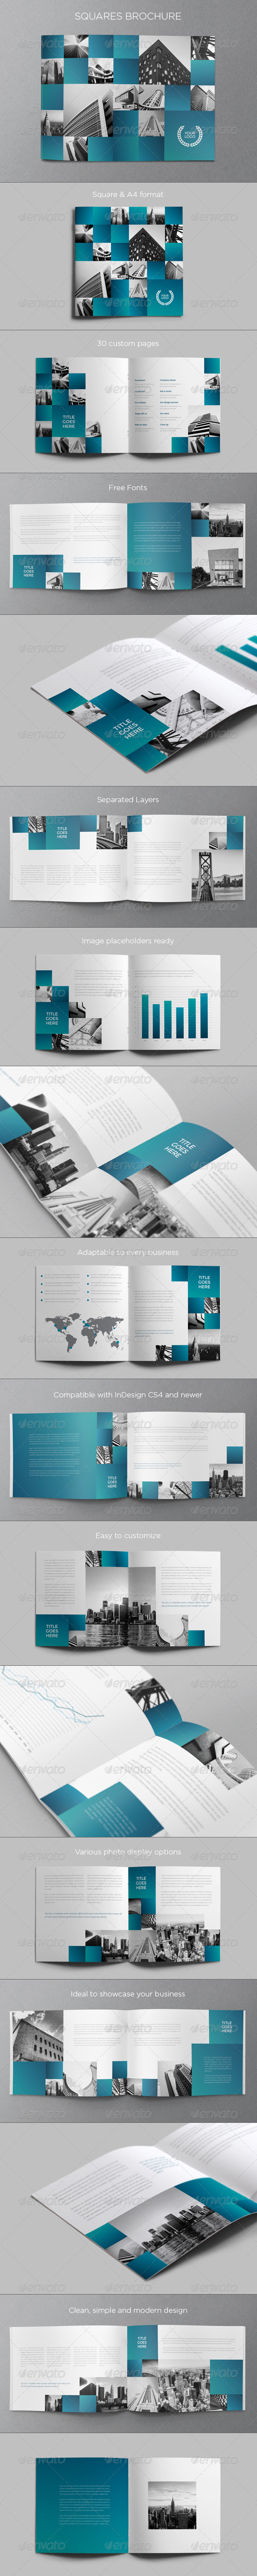 Architecture Squares Brochure - Brochures Print Templates